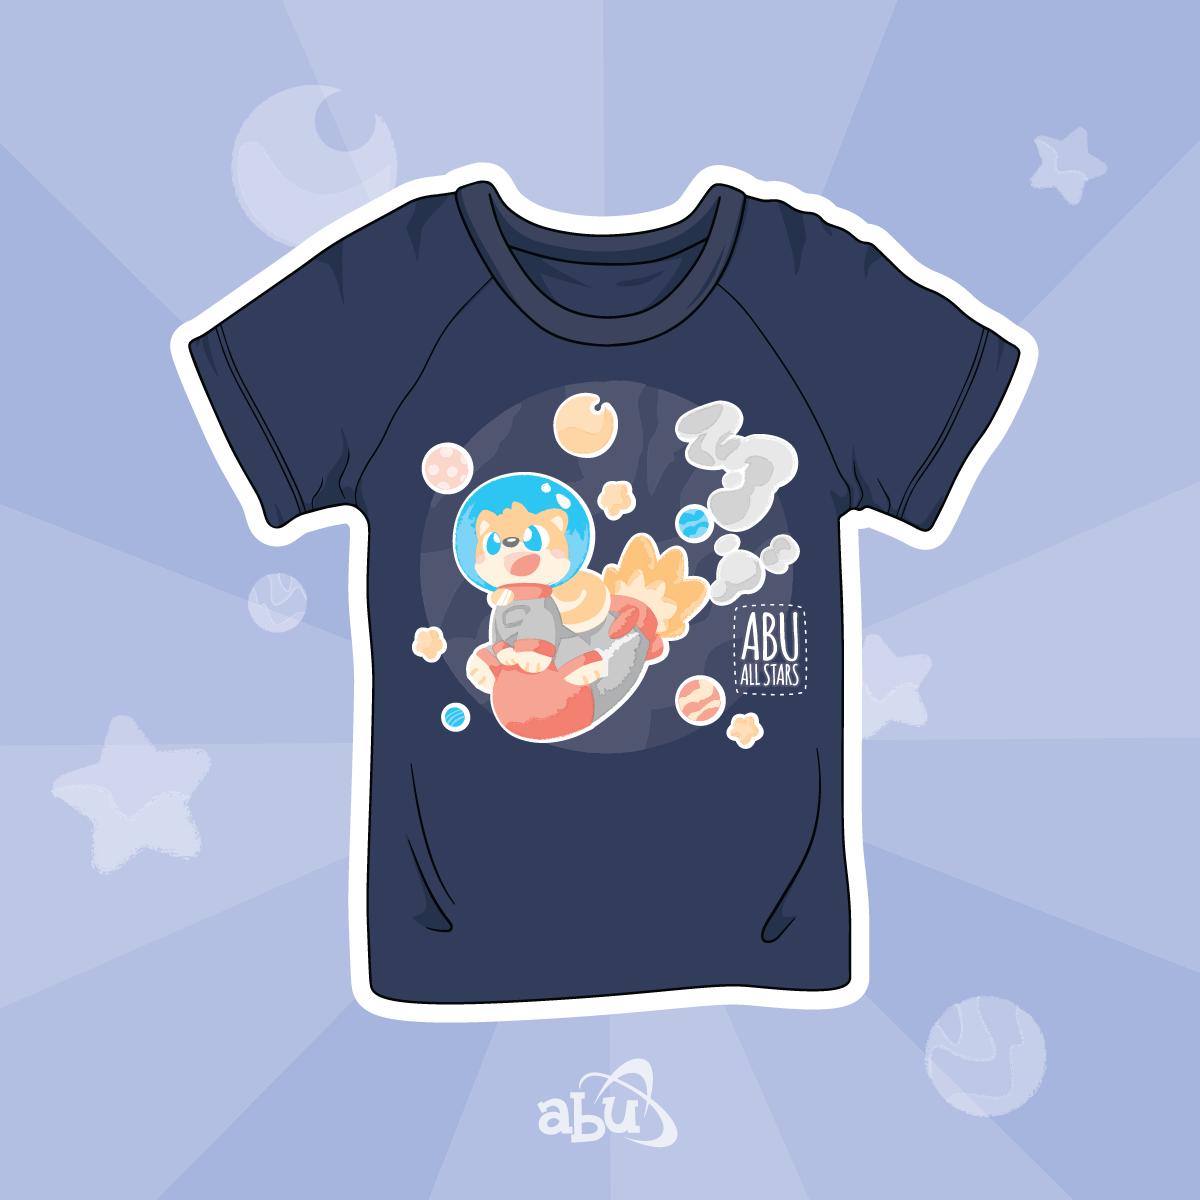 T-Shirt_Feaure_Image_AAS